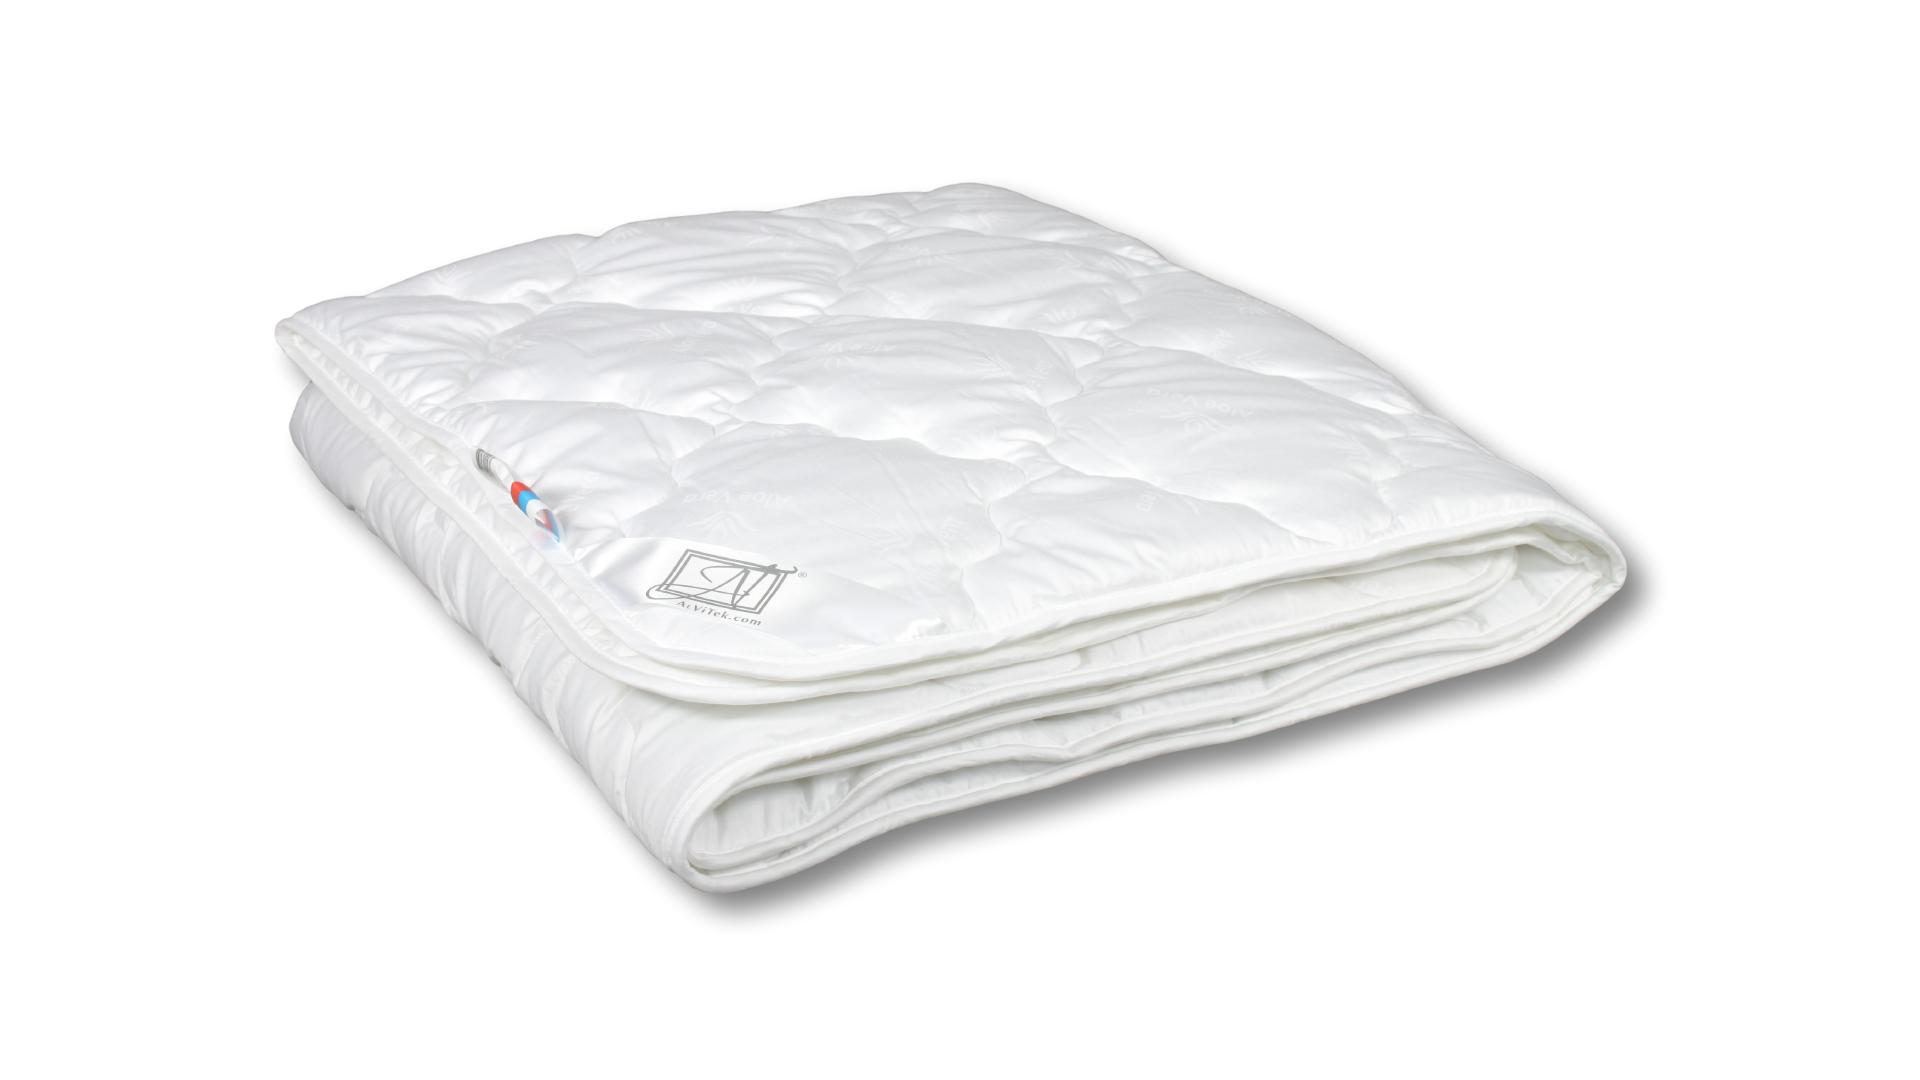 Одеяло Алоэ-Люкс Всесезонное фото FullHD (0)